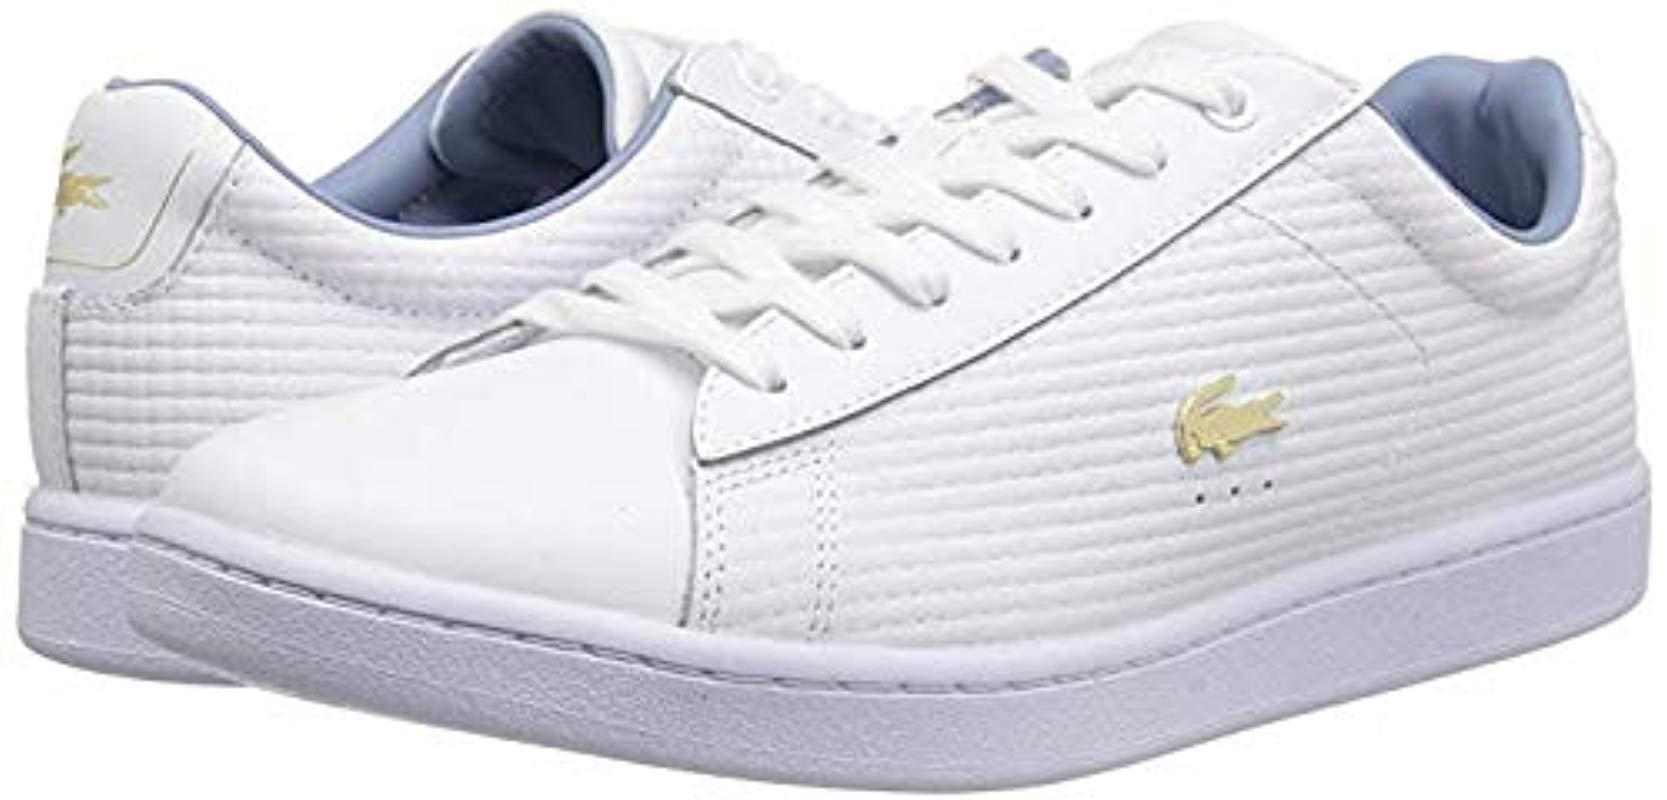 40dd72b9d62d0 Women's White Carnaby Evo 118 6 Spw Sneaker